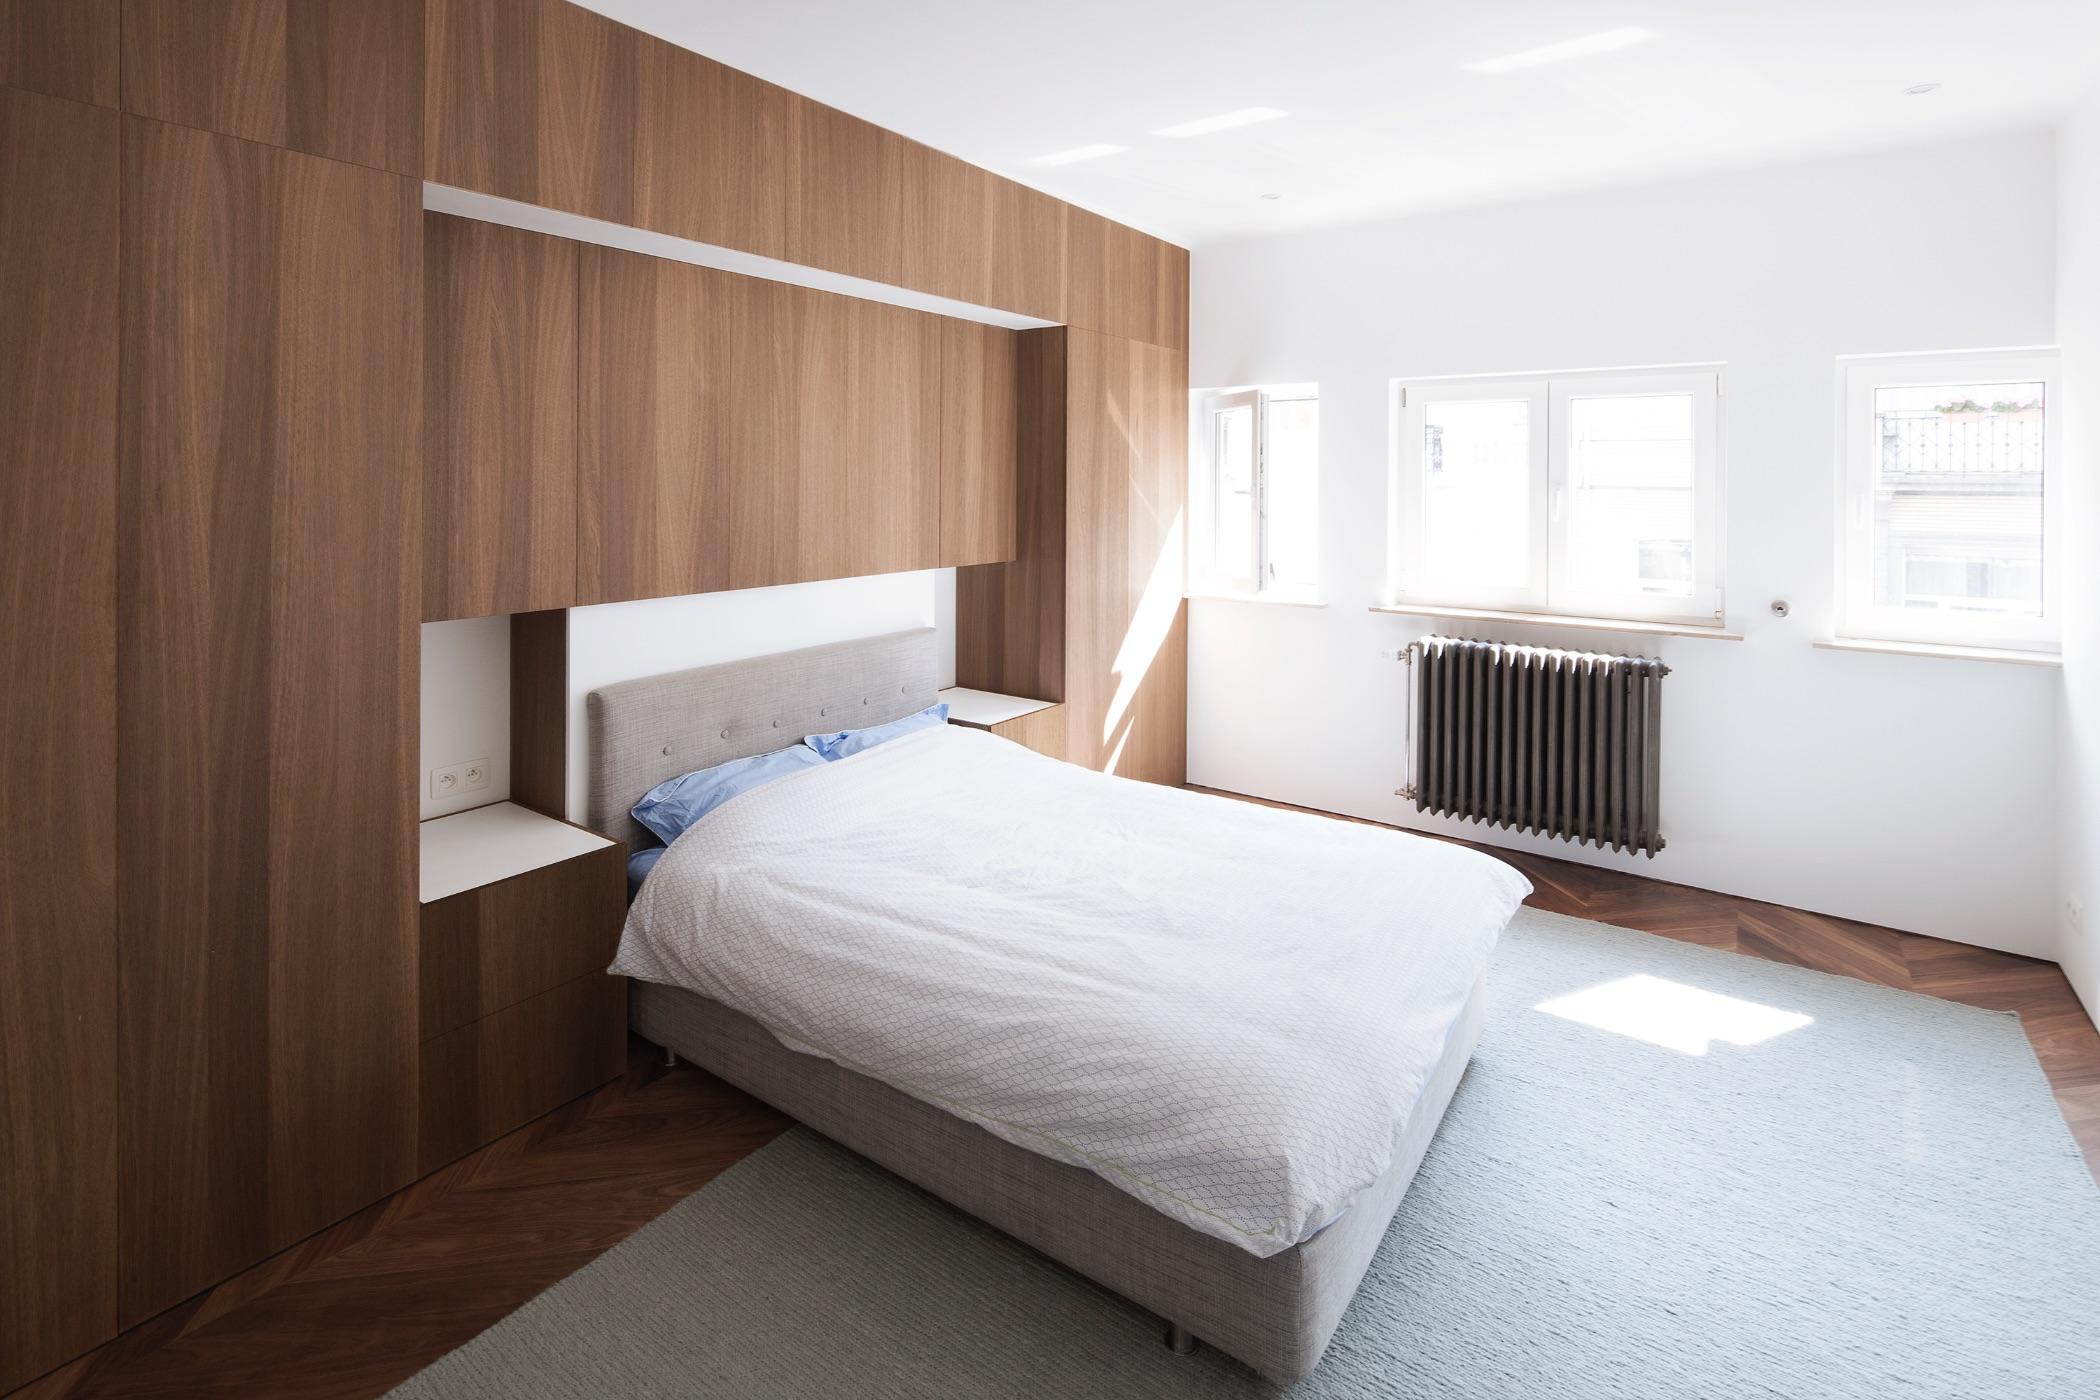 13_A&A's Apartment_Alexandru Patrichi_Inspirationist